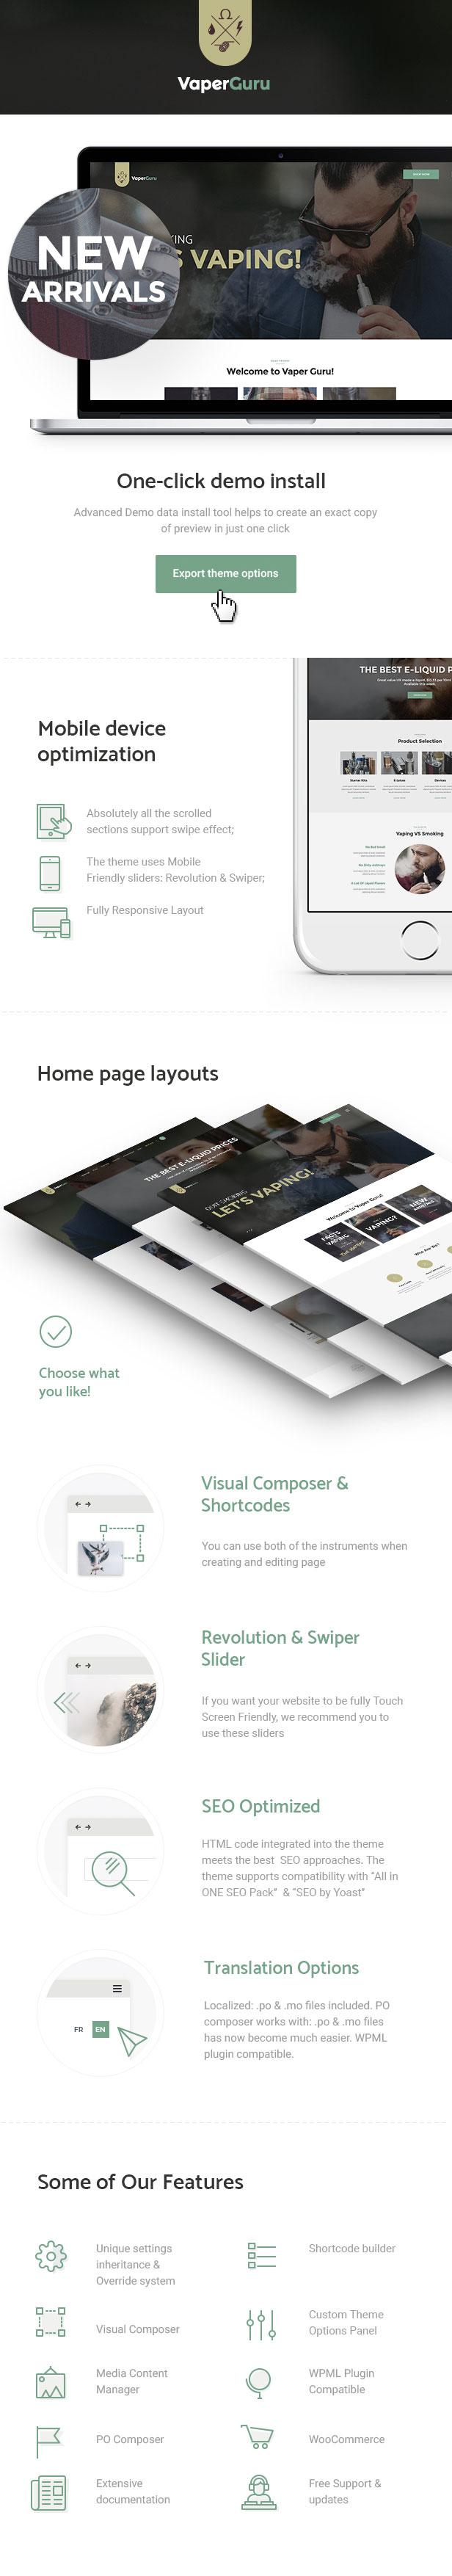 VaperGuru - Vapers Community & Vape Store WordPress Theme - 1